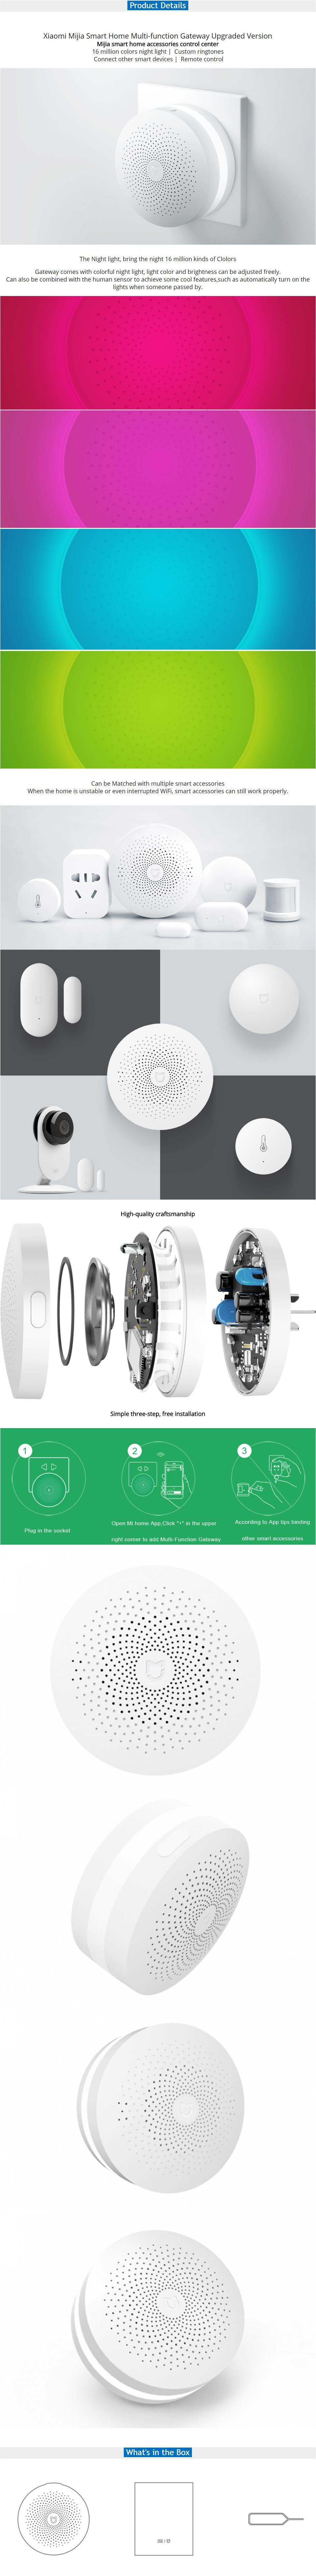 Mijia Smart Home Multi-function Gateway Upgraded ZigBee WiFi Motion